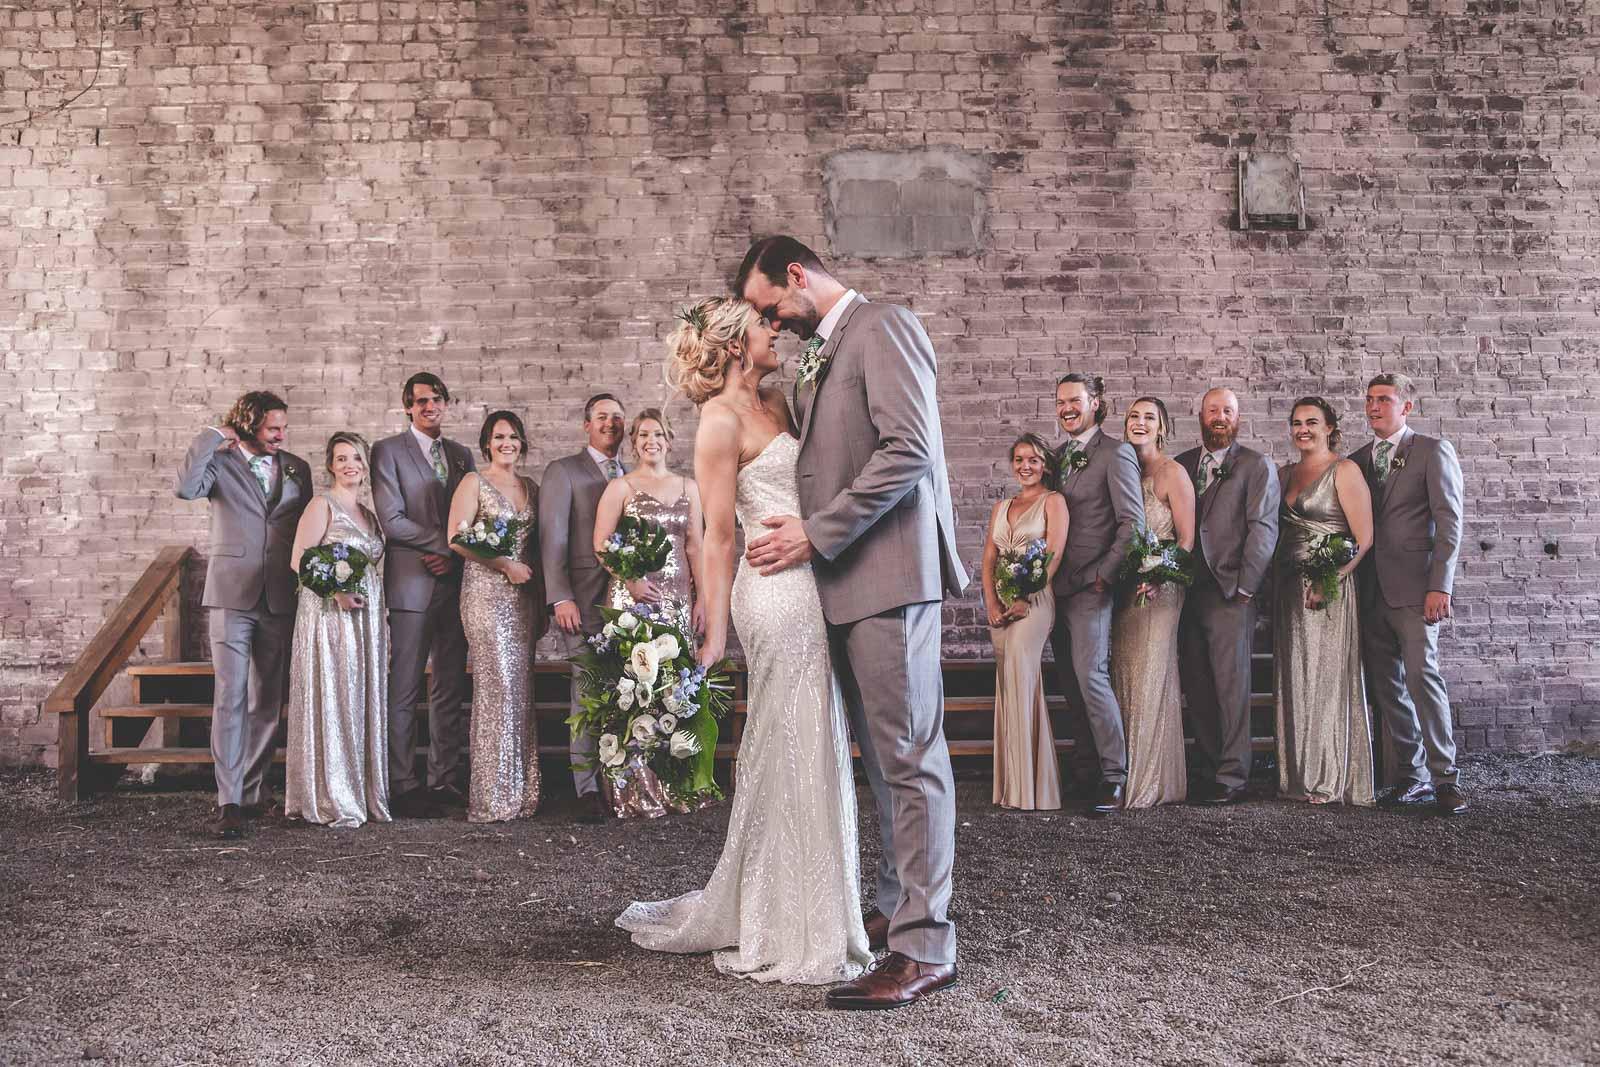 The-Glass-Factory-Wedding-Photographer-Adam-Szarmack-39.jpg